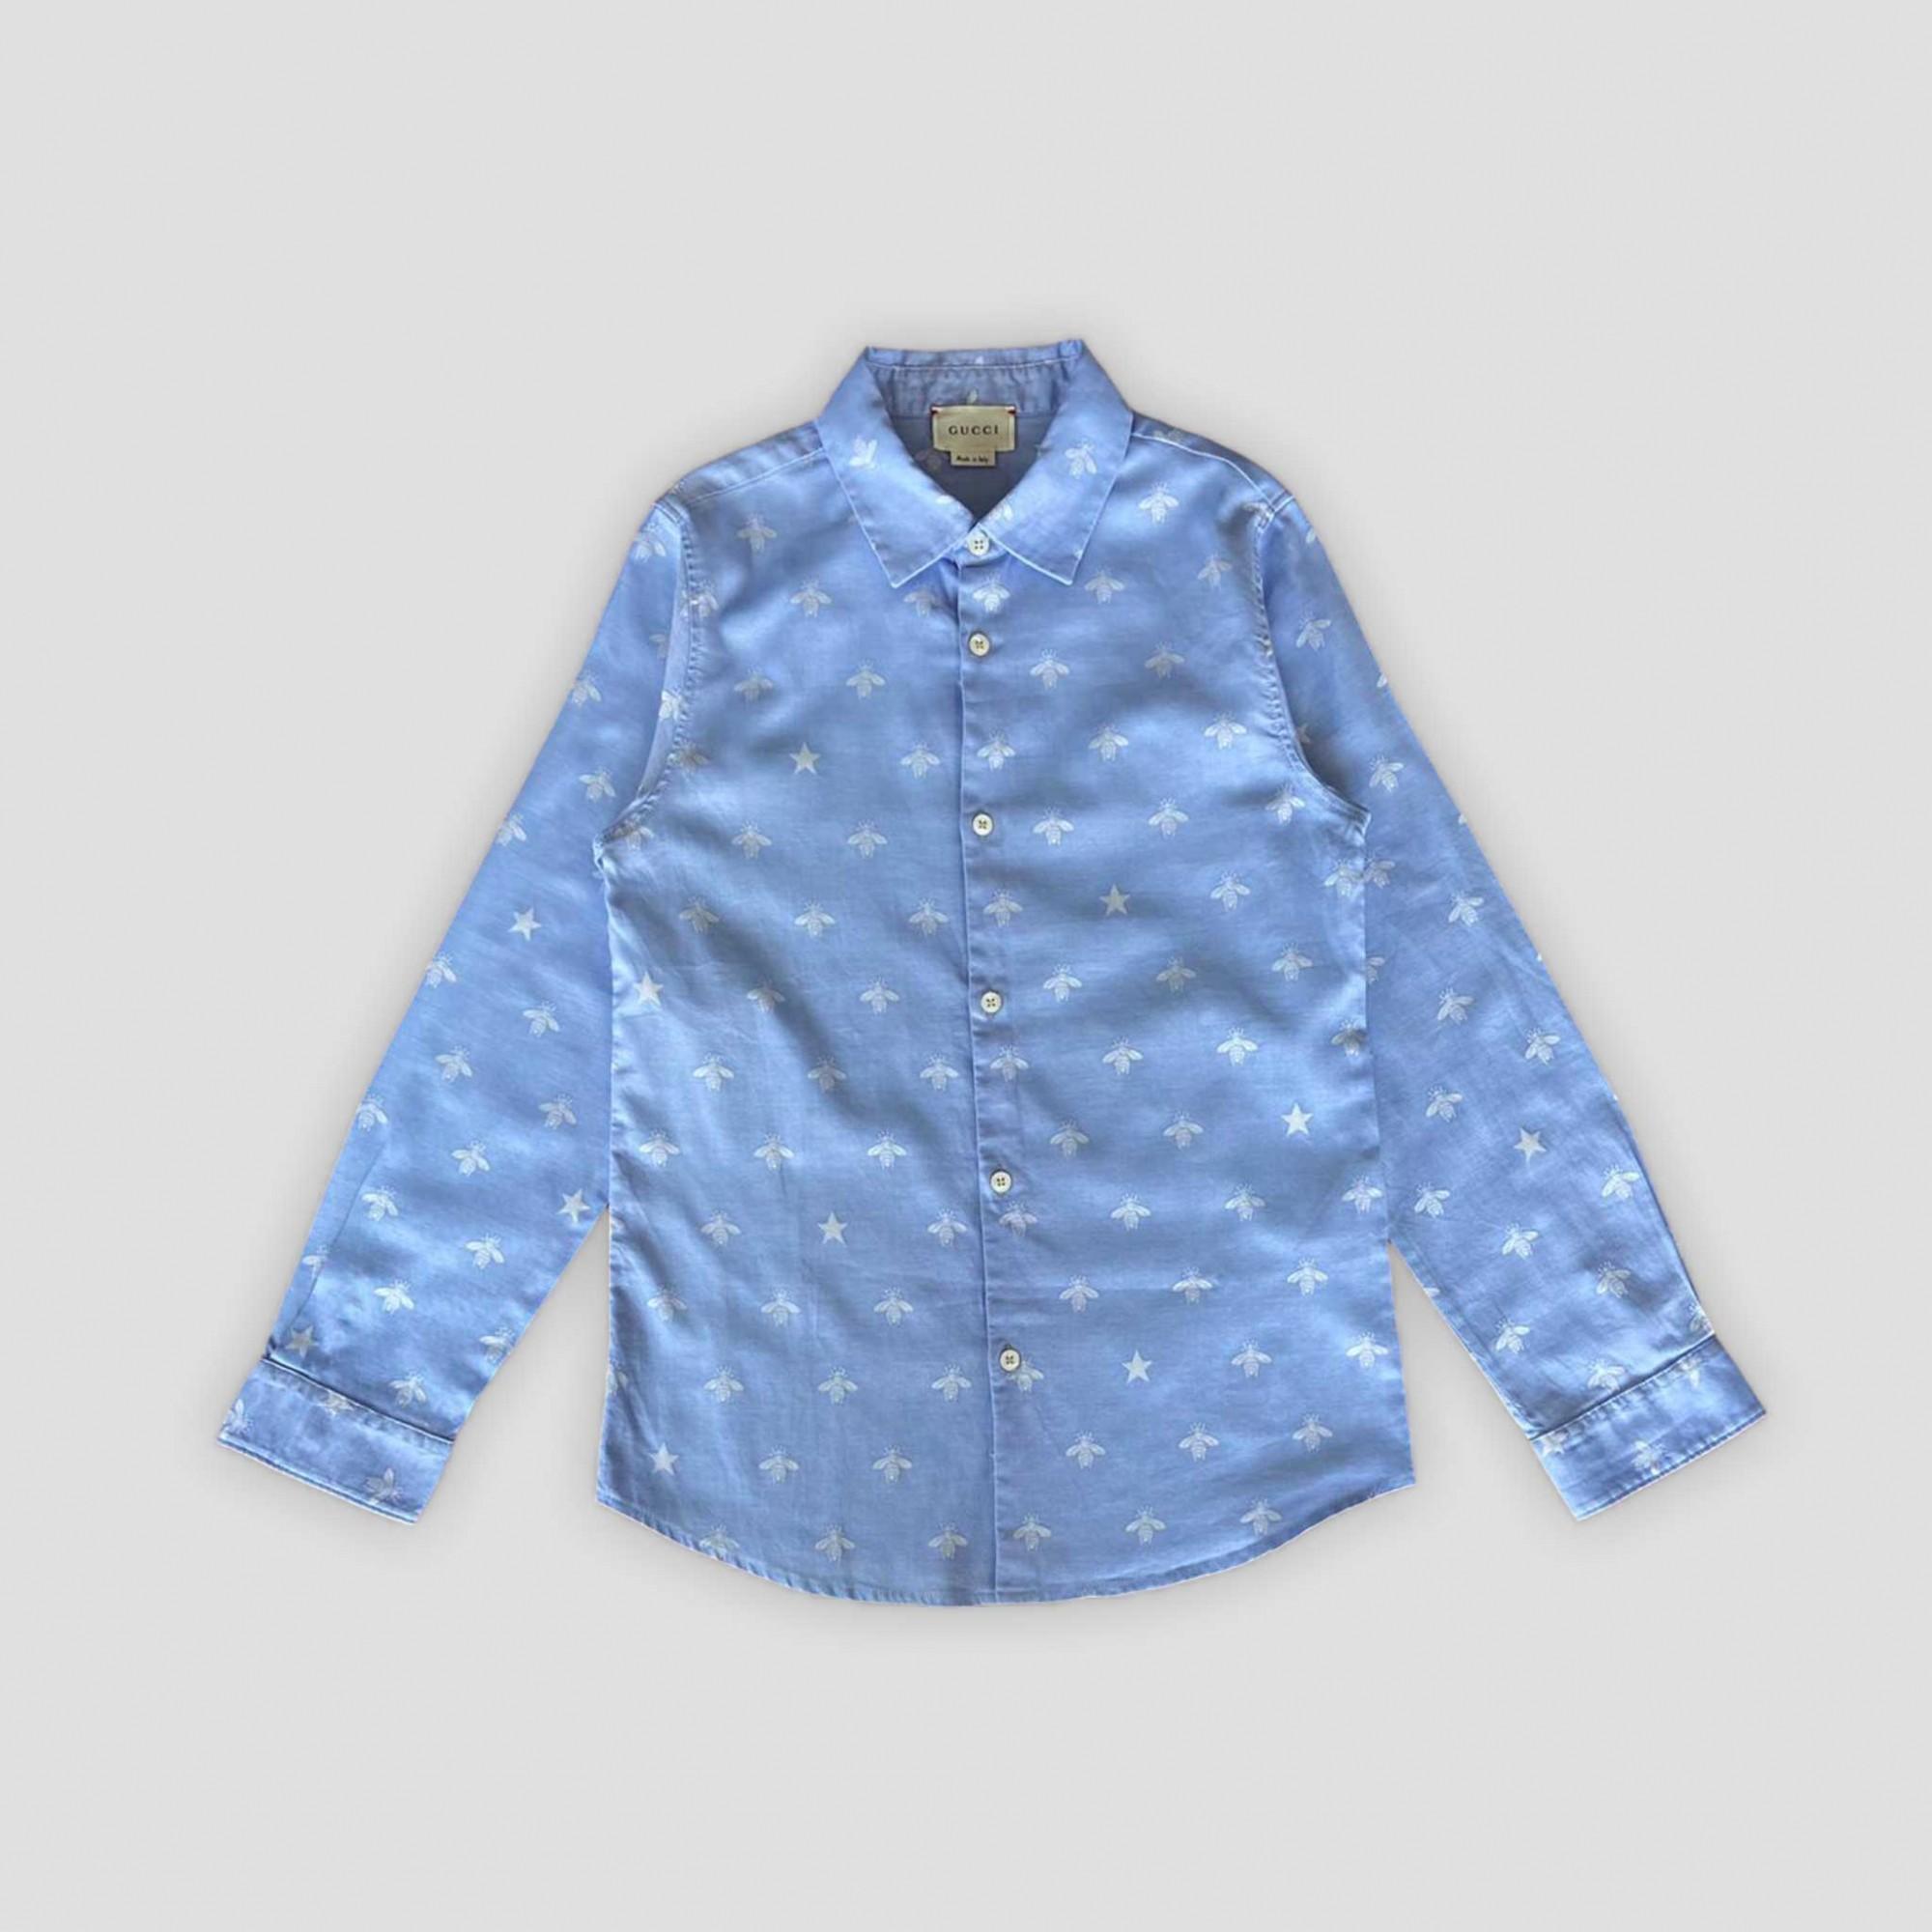 Camisa Gucci 10 anos